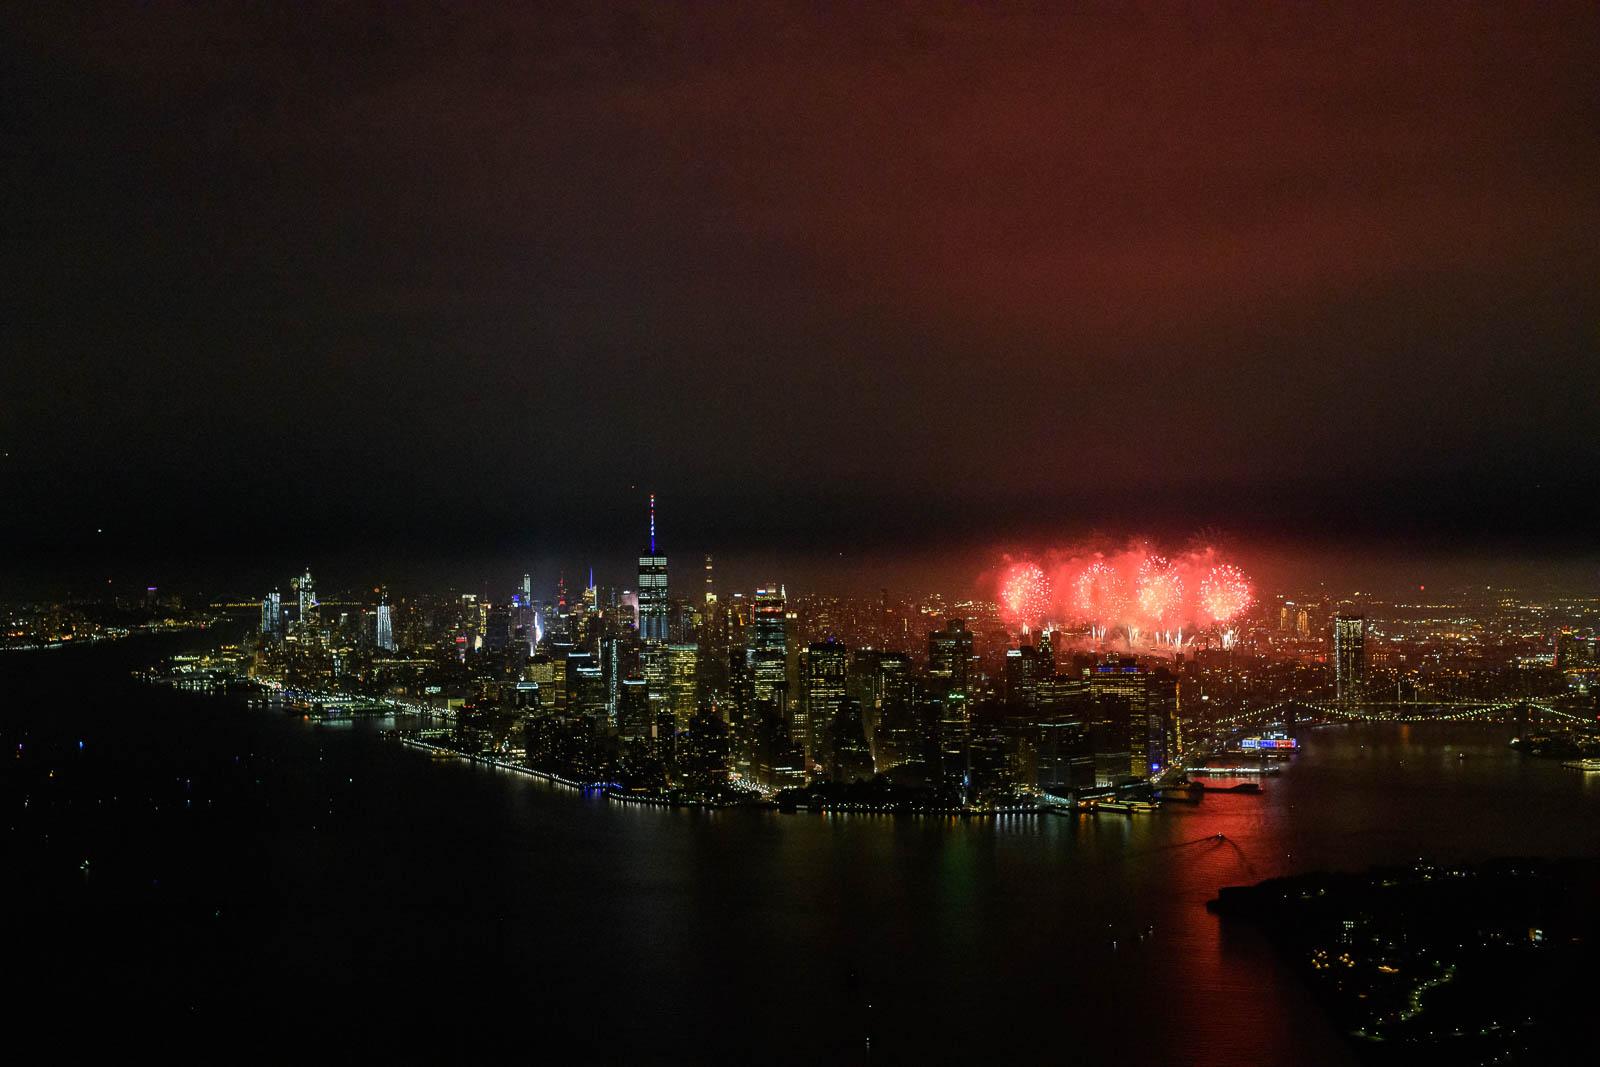 New York City July 4th Fireworks